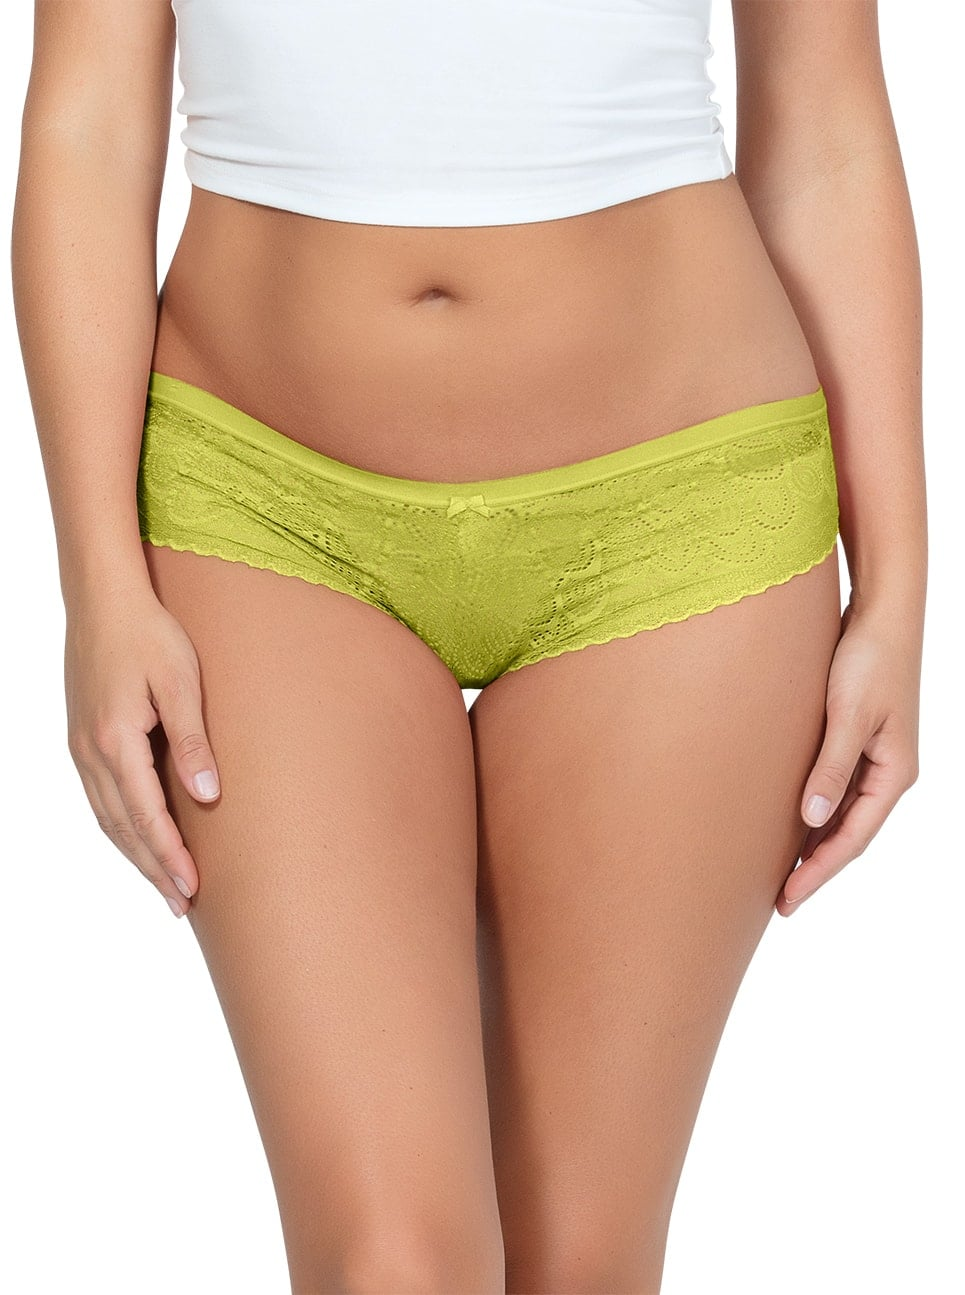 PARFAIT ParfaitPanty SoGlam HipsterPP502 Lemonade Front - Parfait Panty So Glam Hipster - Lemonade - PP502